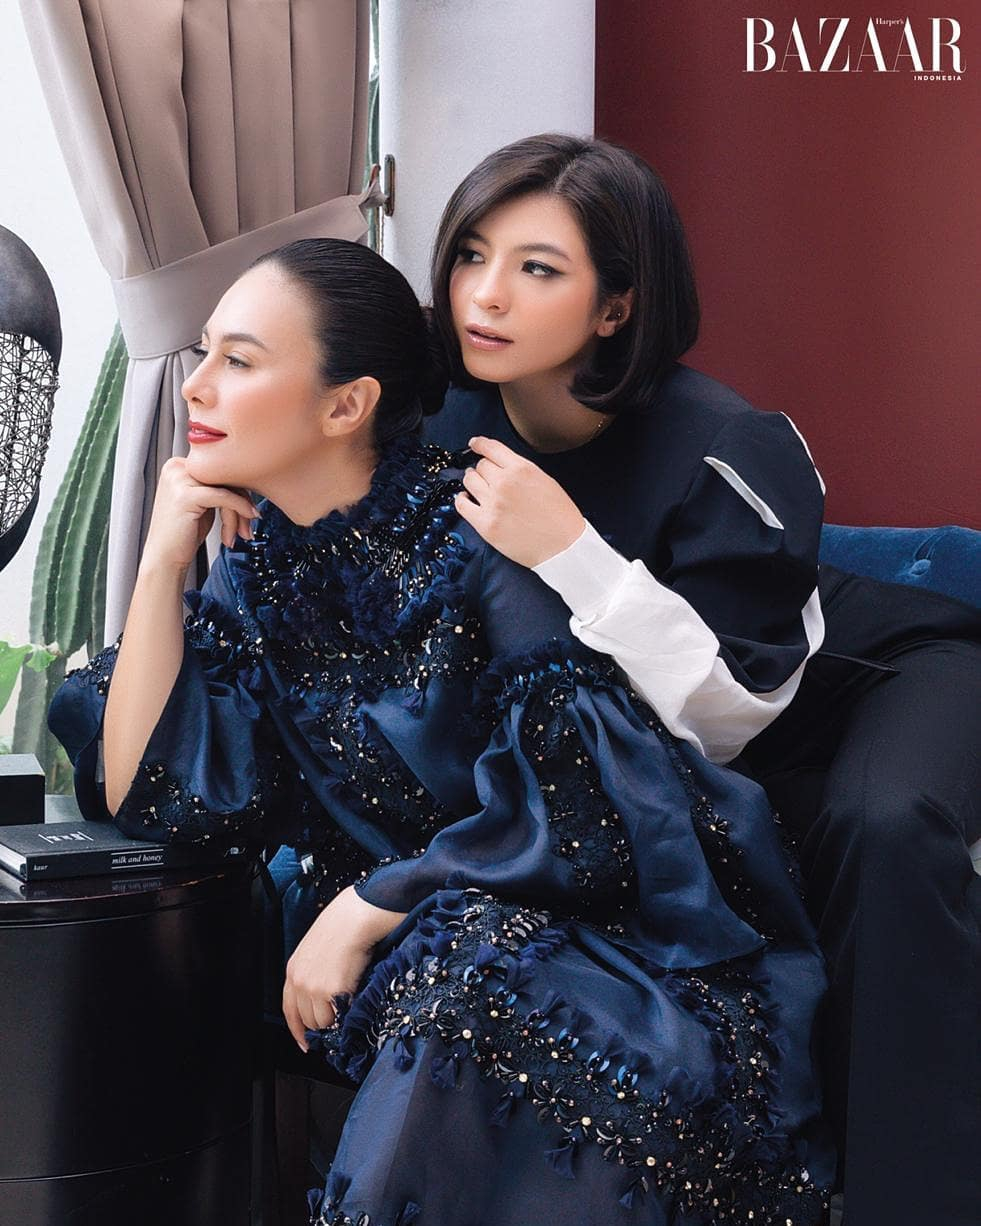 Ini Alasan Putri Wulan Guritno, Shalom Razade, Tak Terjun ke Industri Hiburan Sejak Belia